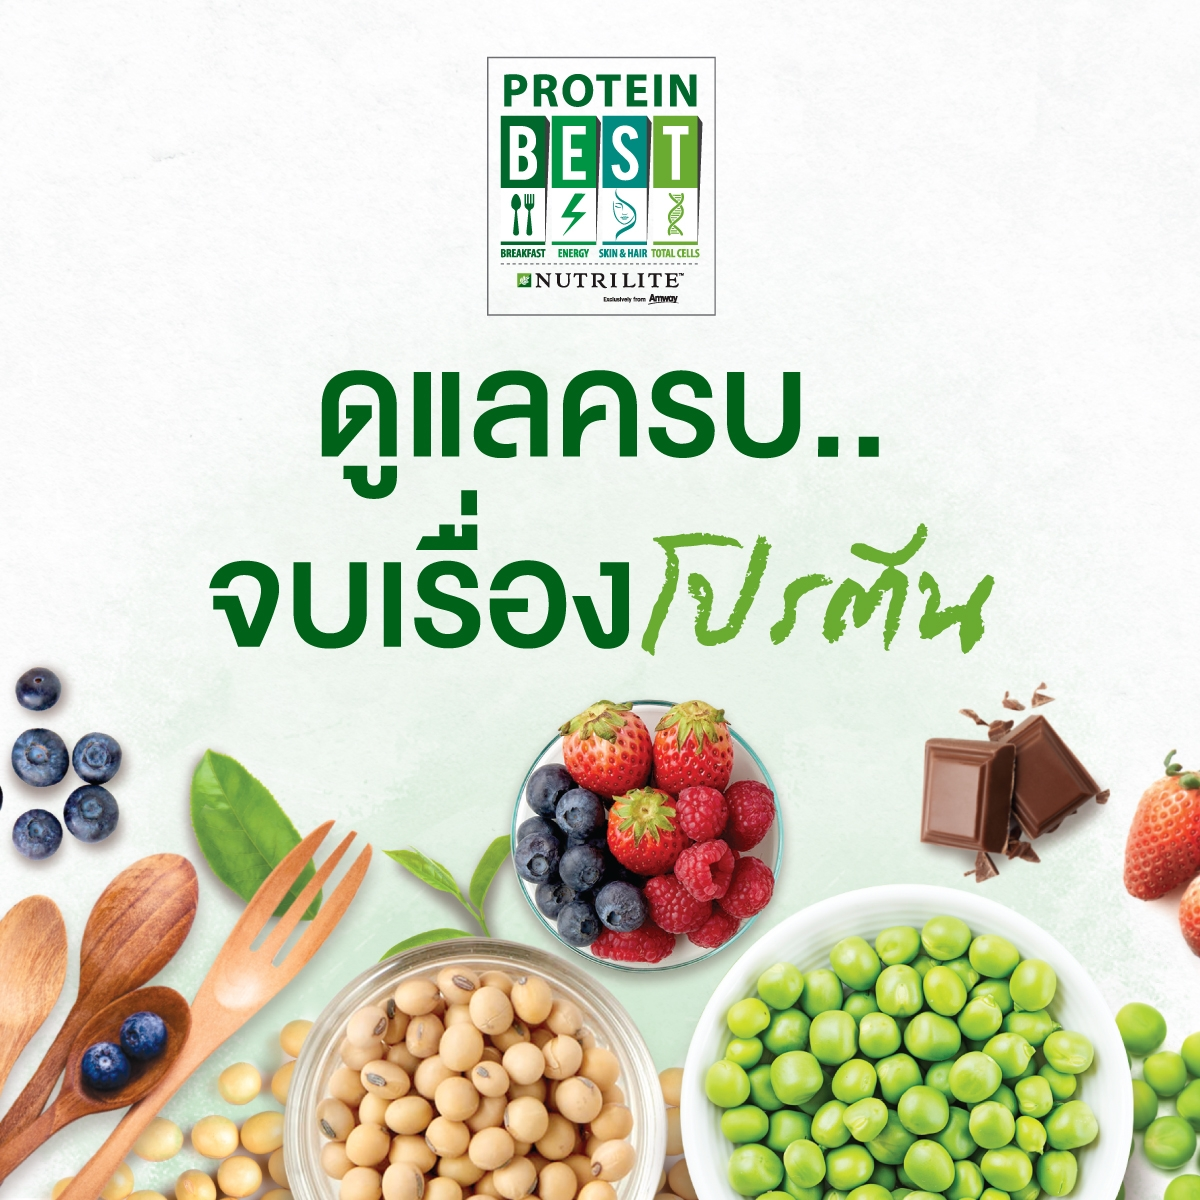 proteinbest-thumbnail.jpg